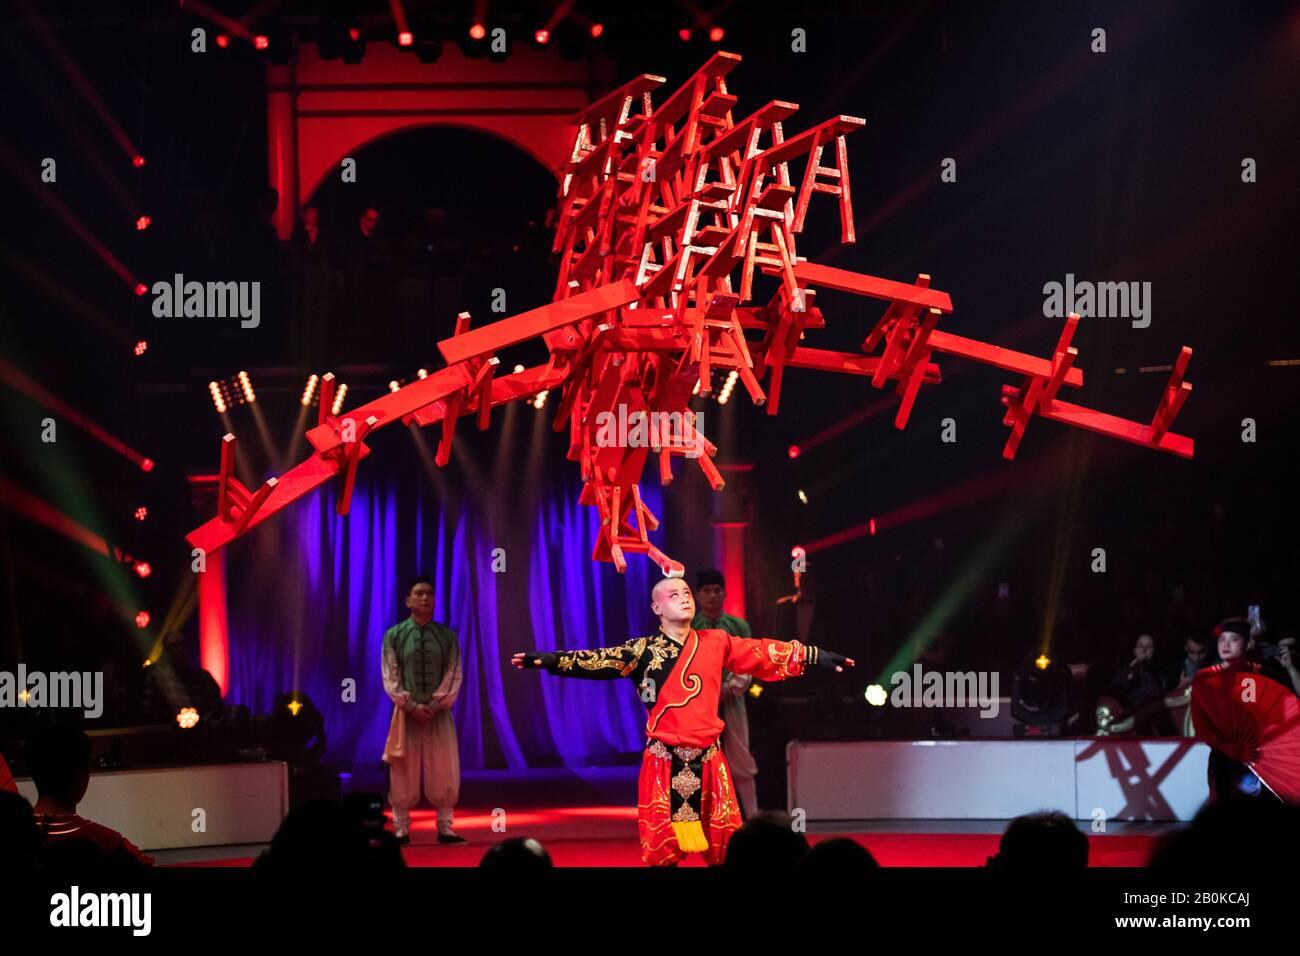 "Girona, SPANIEN - 18. FEBRUAR: Anhui Akrobatische Troupe aus China treten während des ""Elefant d'Or"" International Circus Festival im Parc de la Devesa am Februar auf Stockfoto"